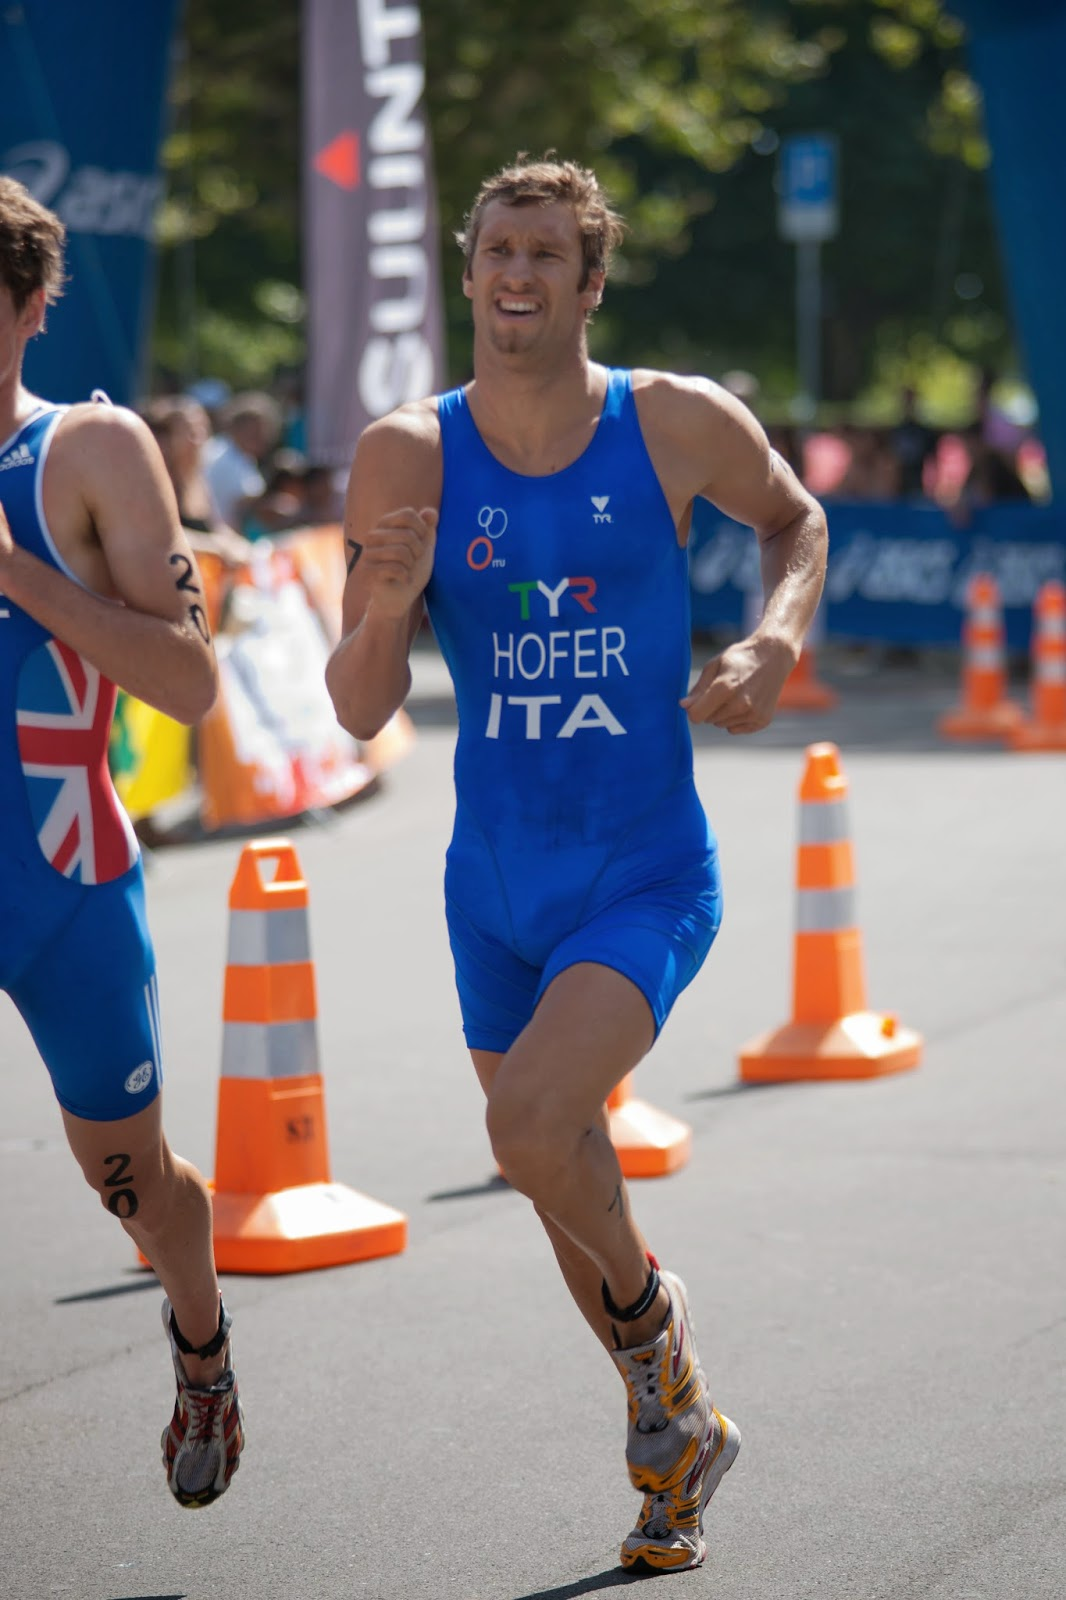 Male Athletes World: Triathlon: Thai triathlete Wongkhan